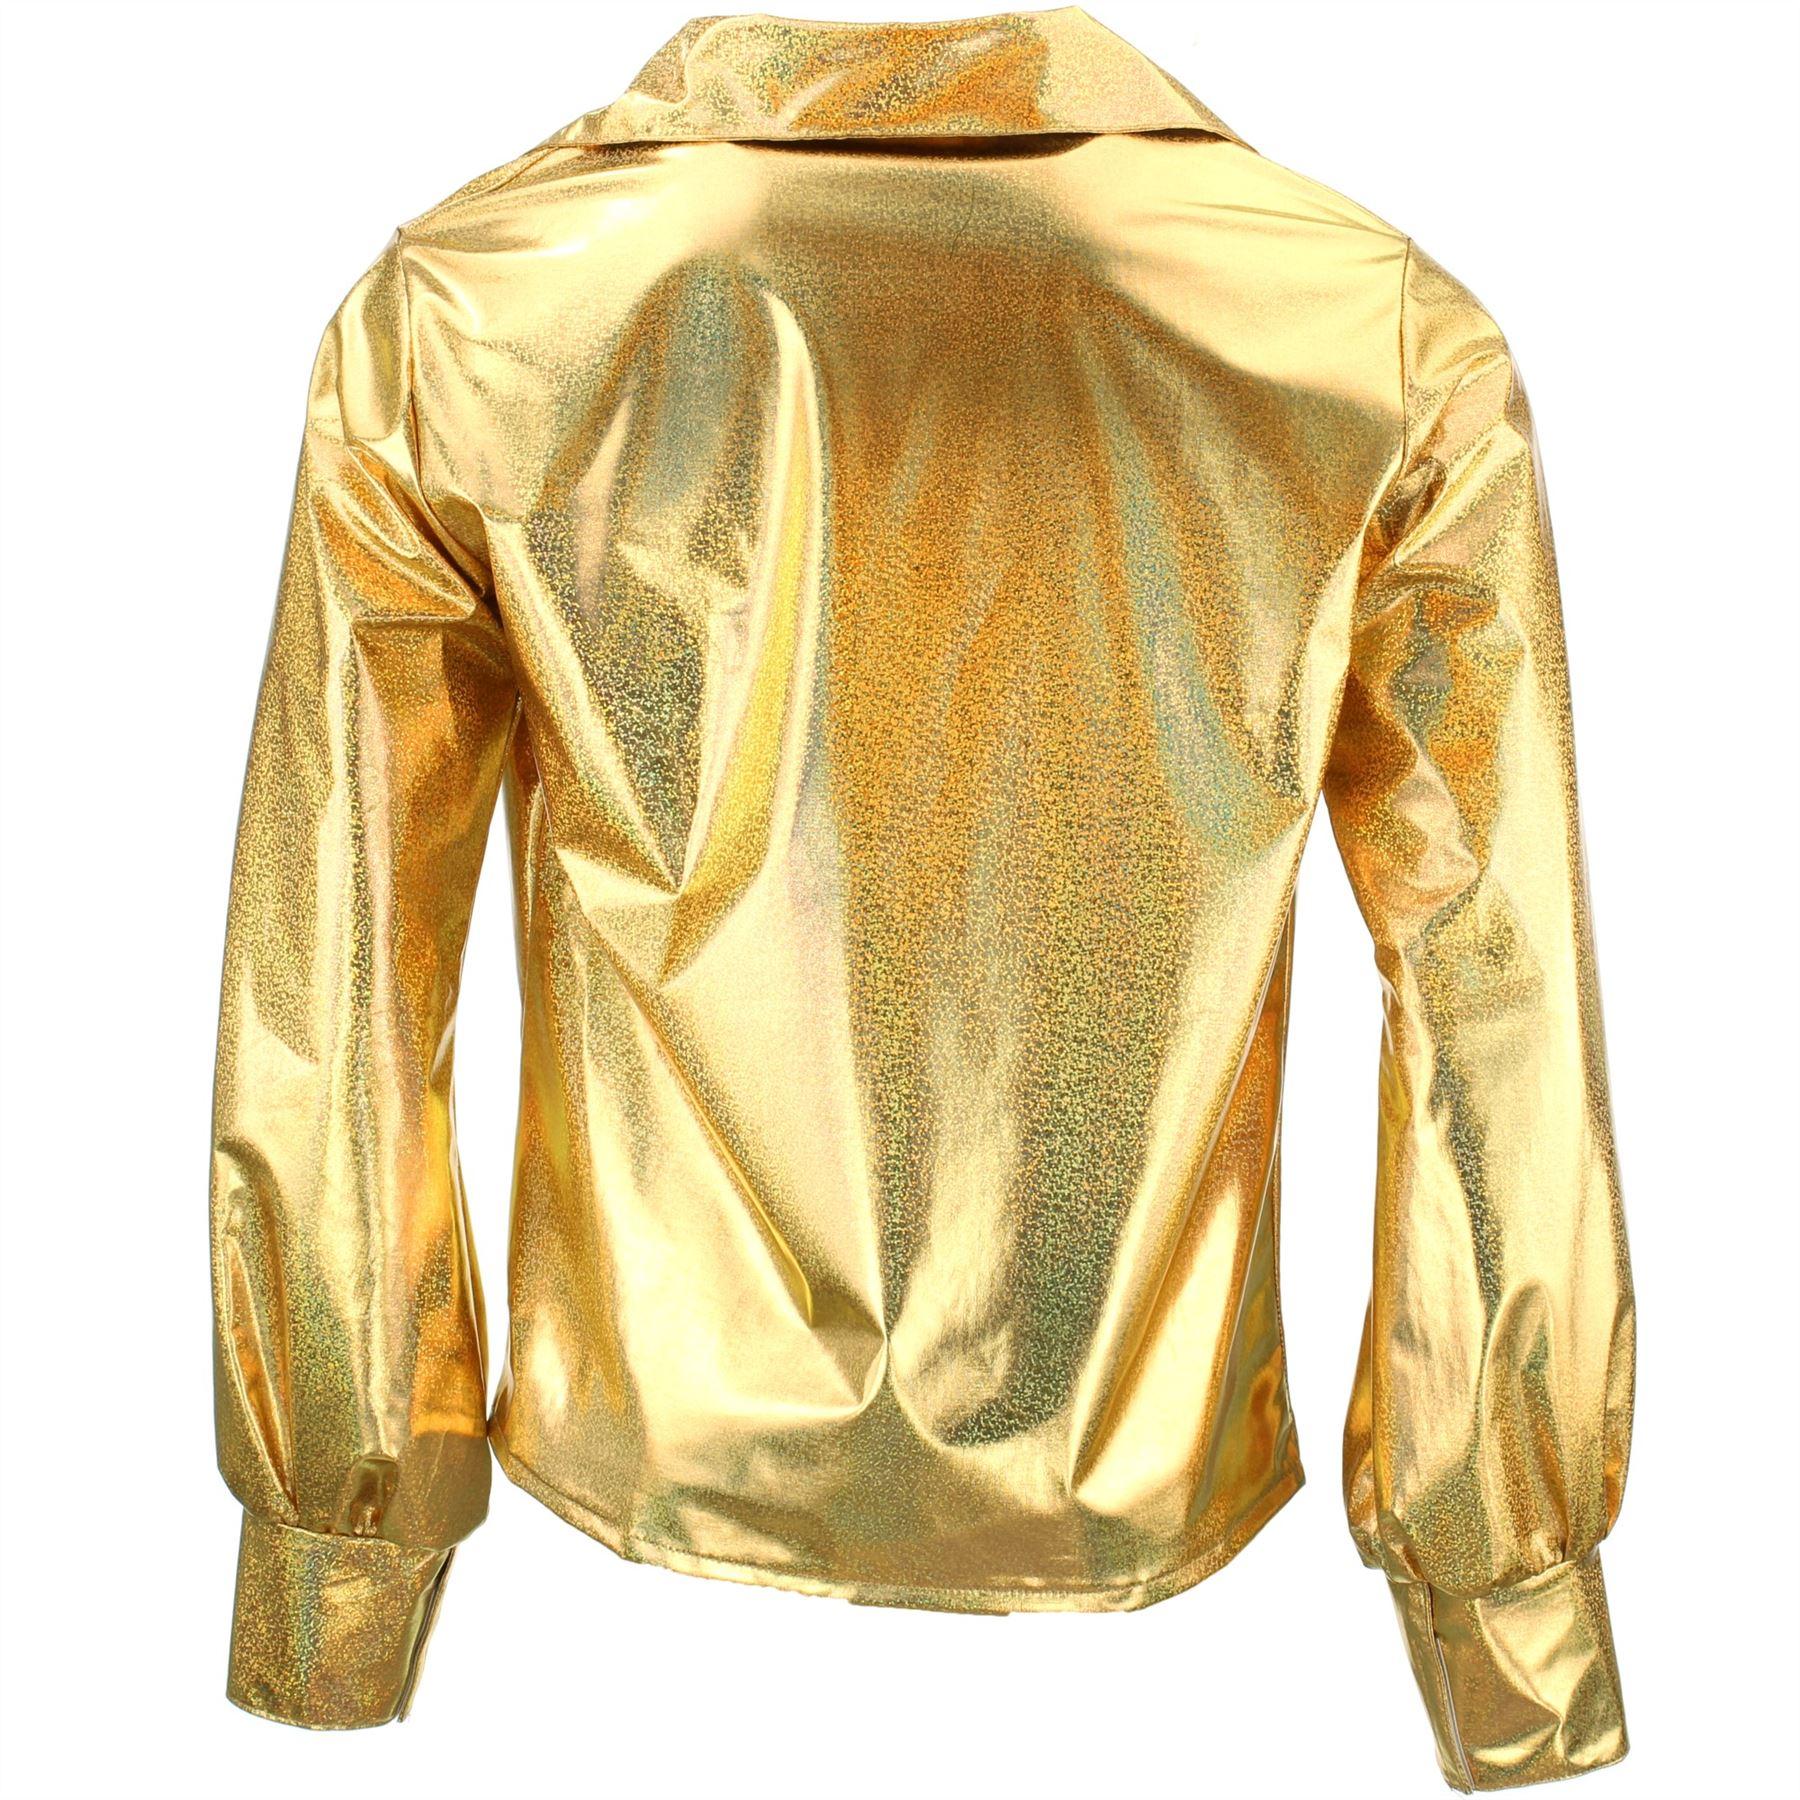 Shiny Metallic 70/'s Shirt Firefly Party Dressing up